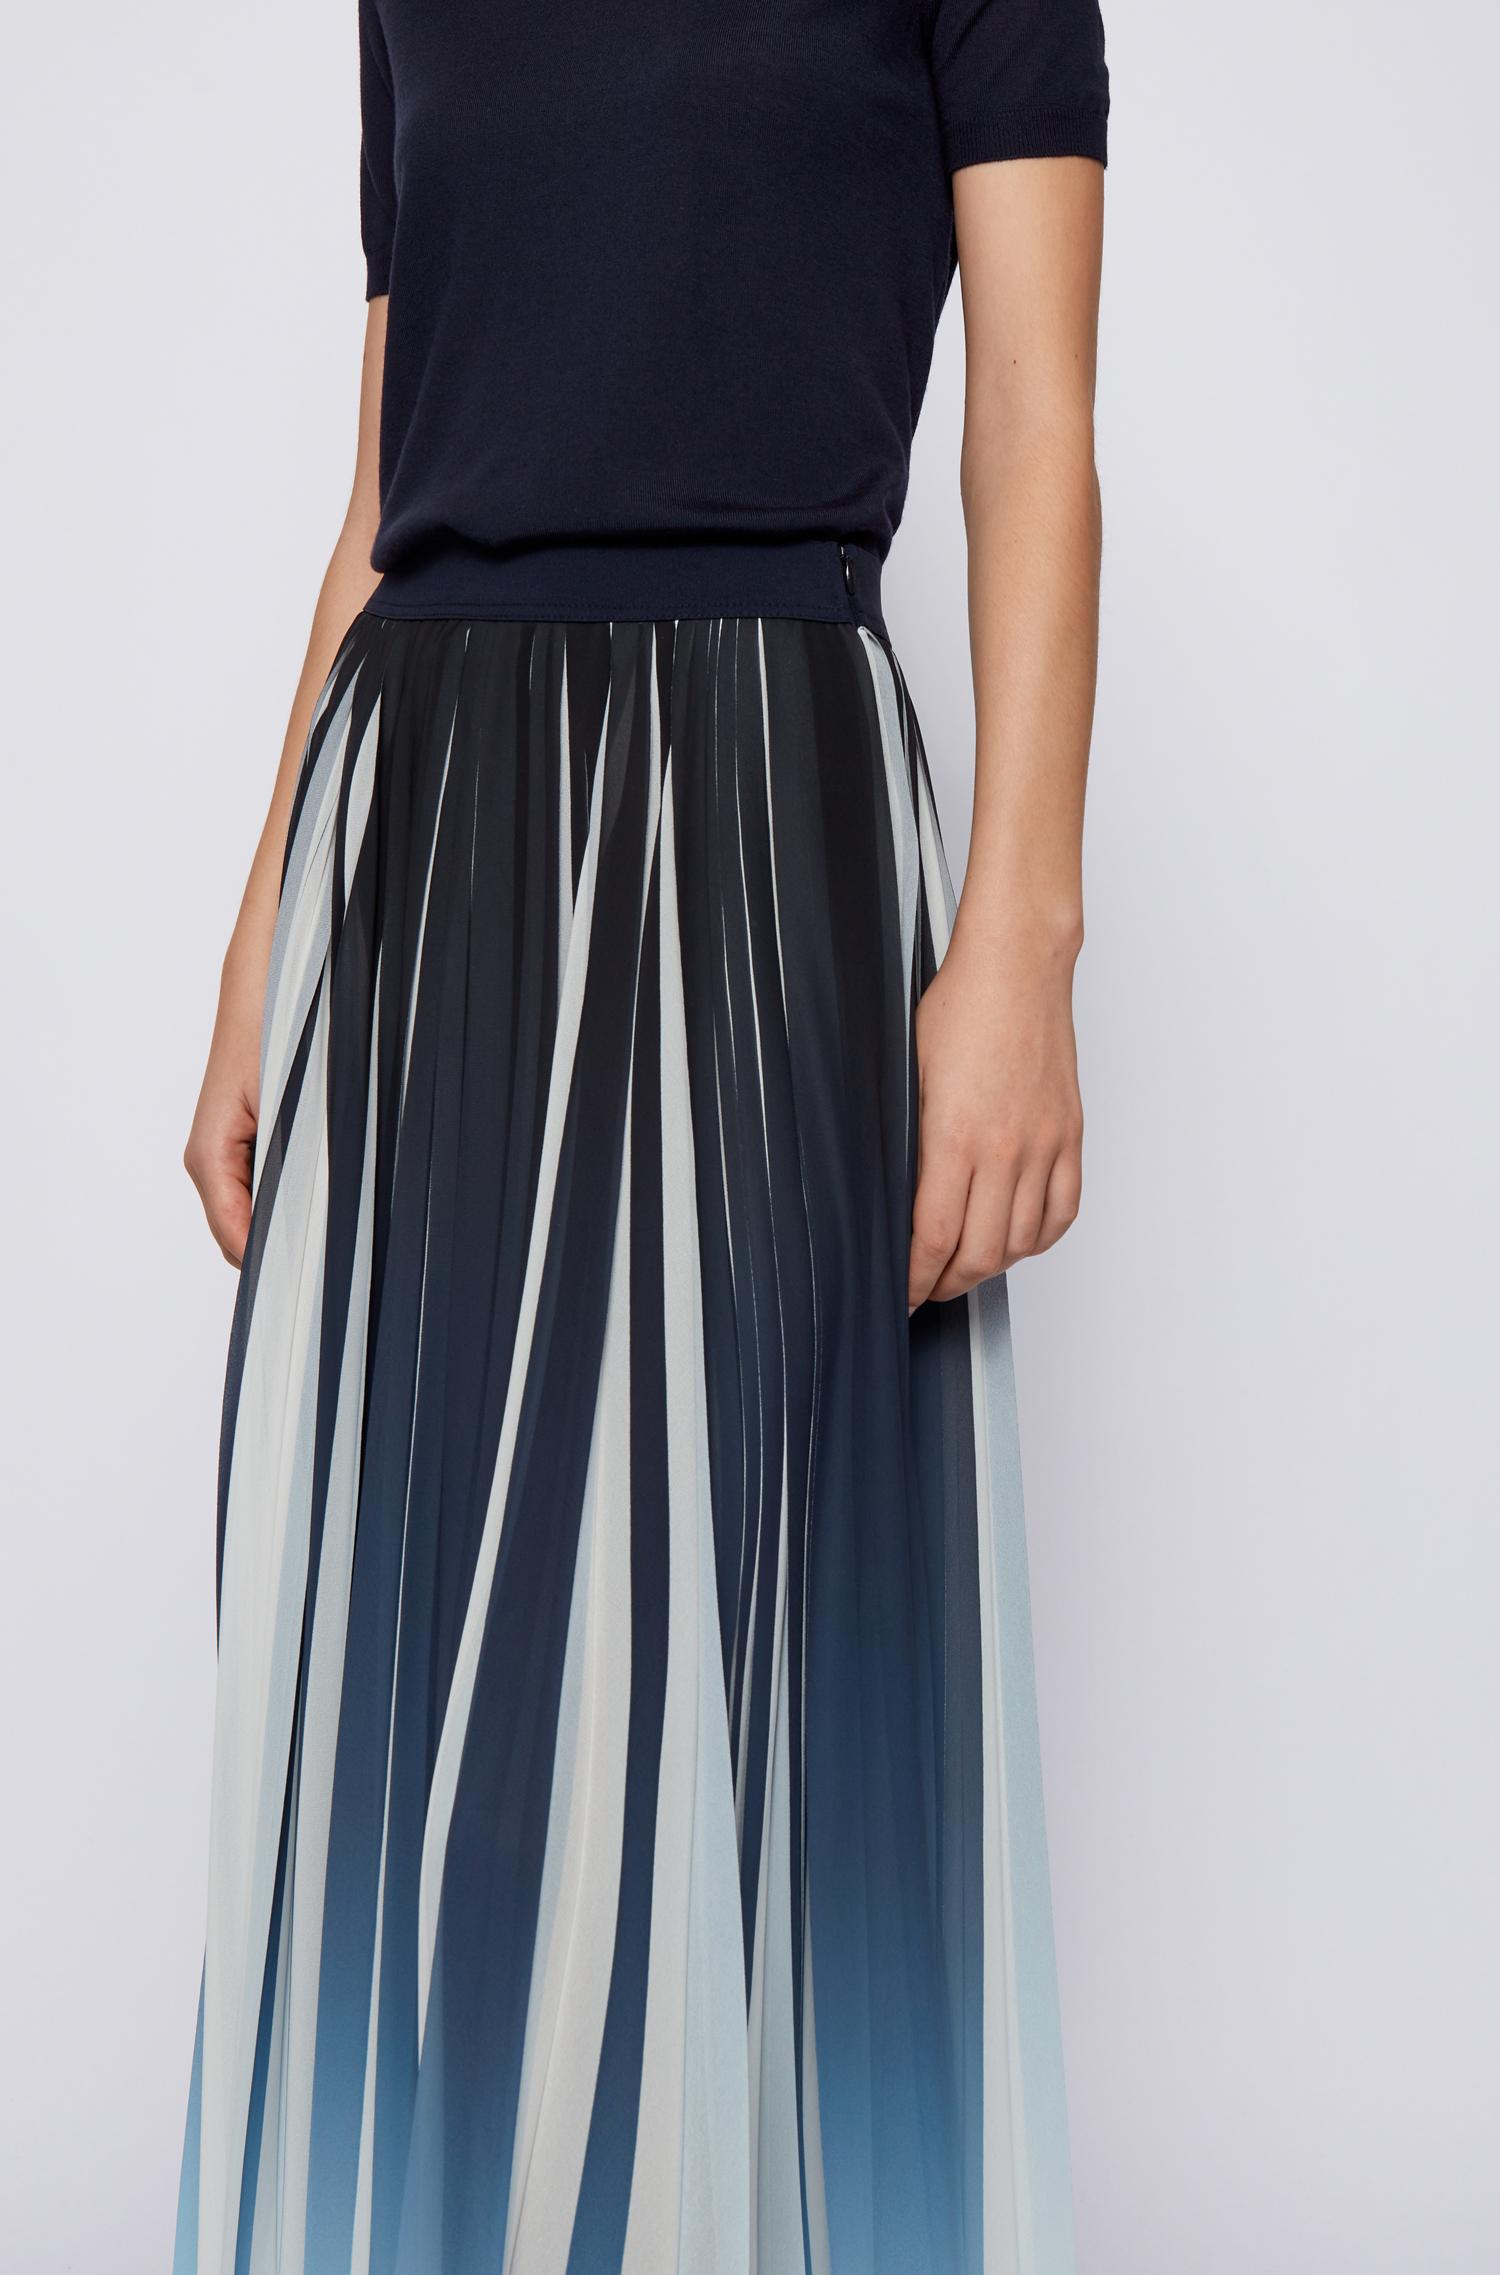 Pleated midi skirt in chiffon with dégradé print BOSS | Skirts | 50447599466